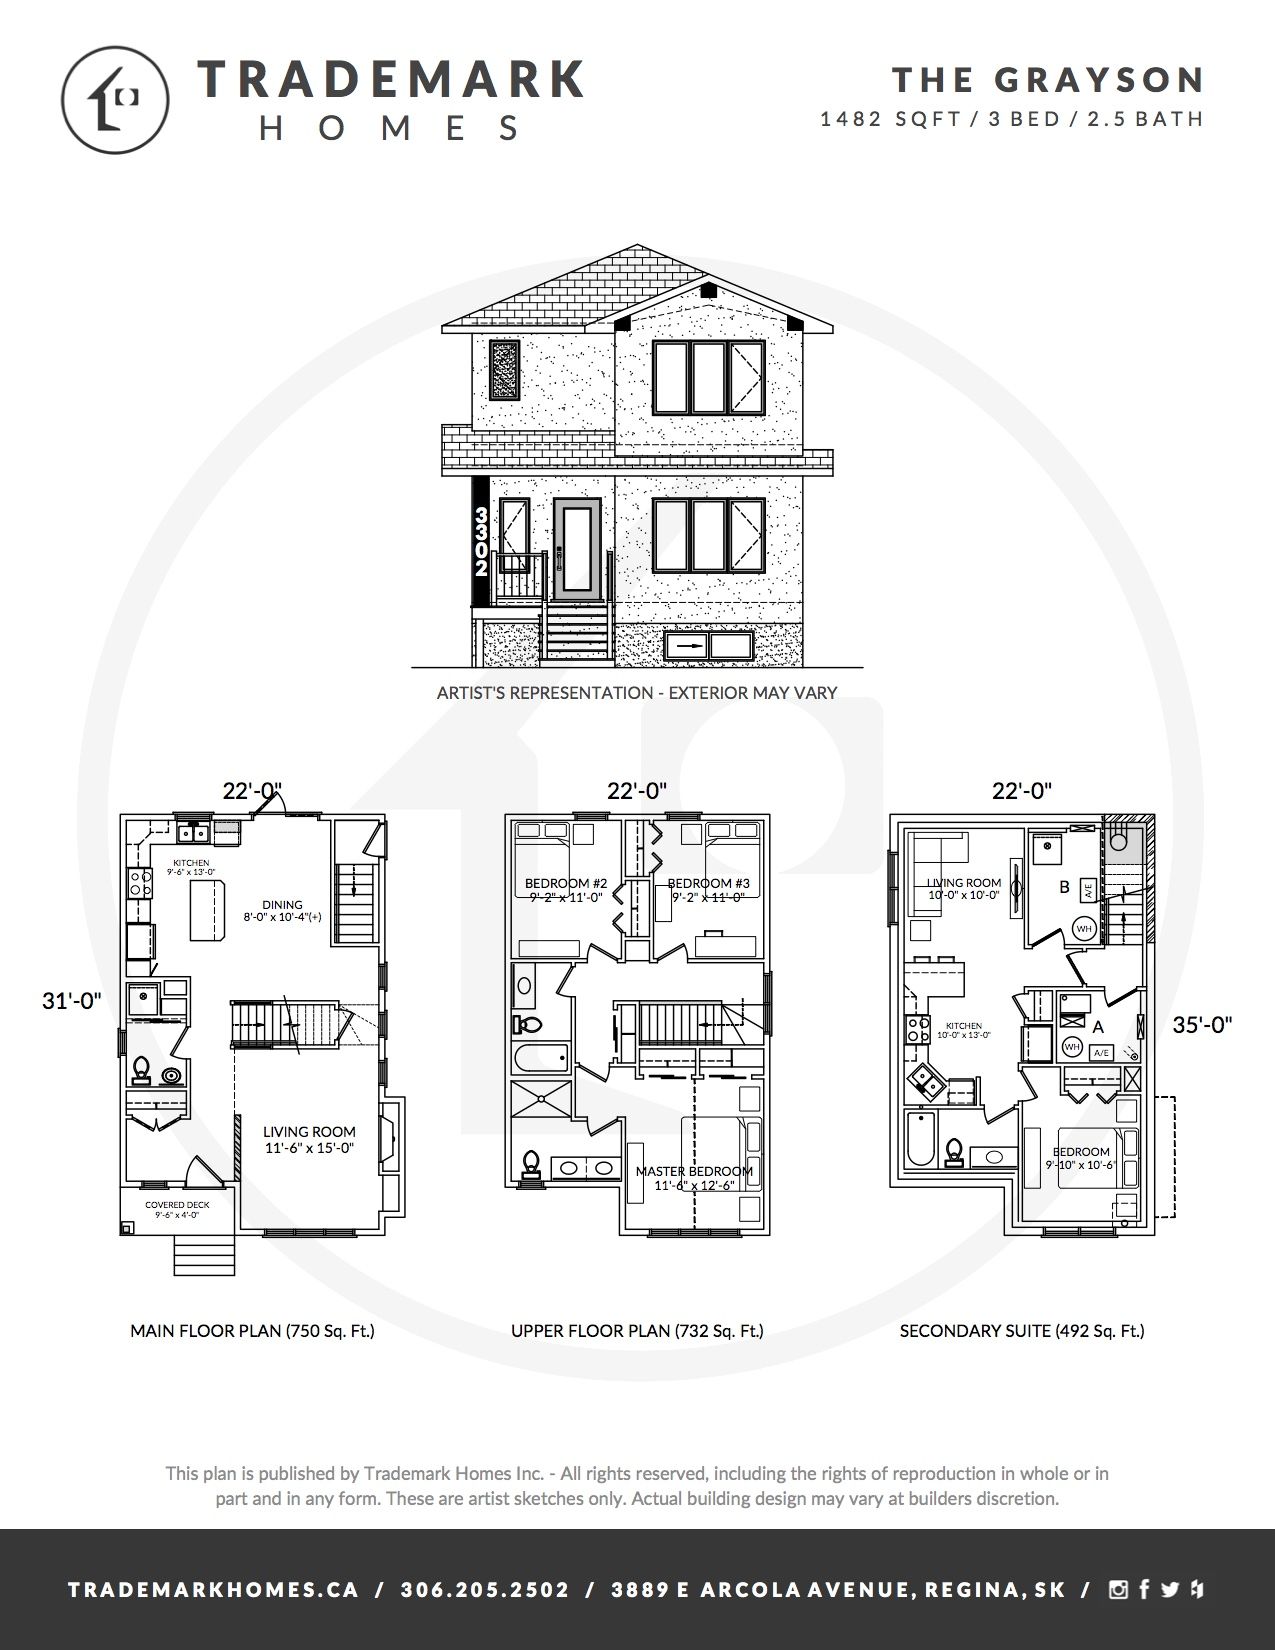 Trademark Homes The Grayson Lane Lot